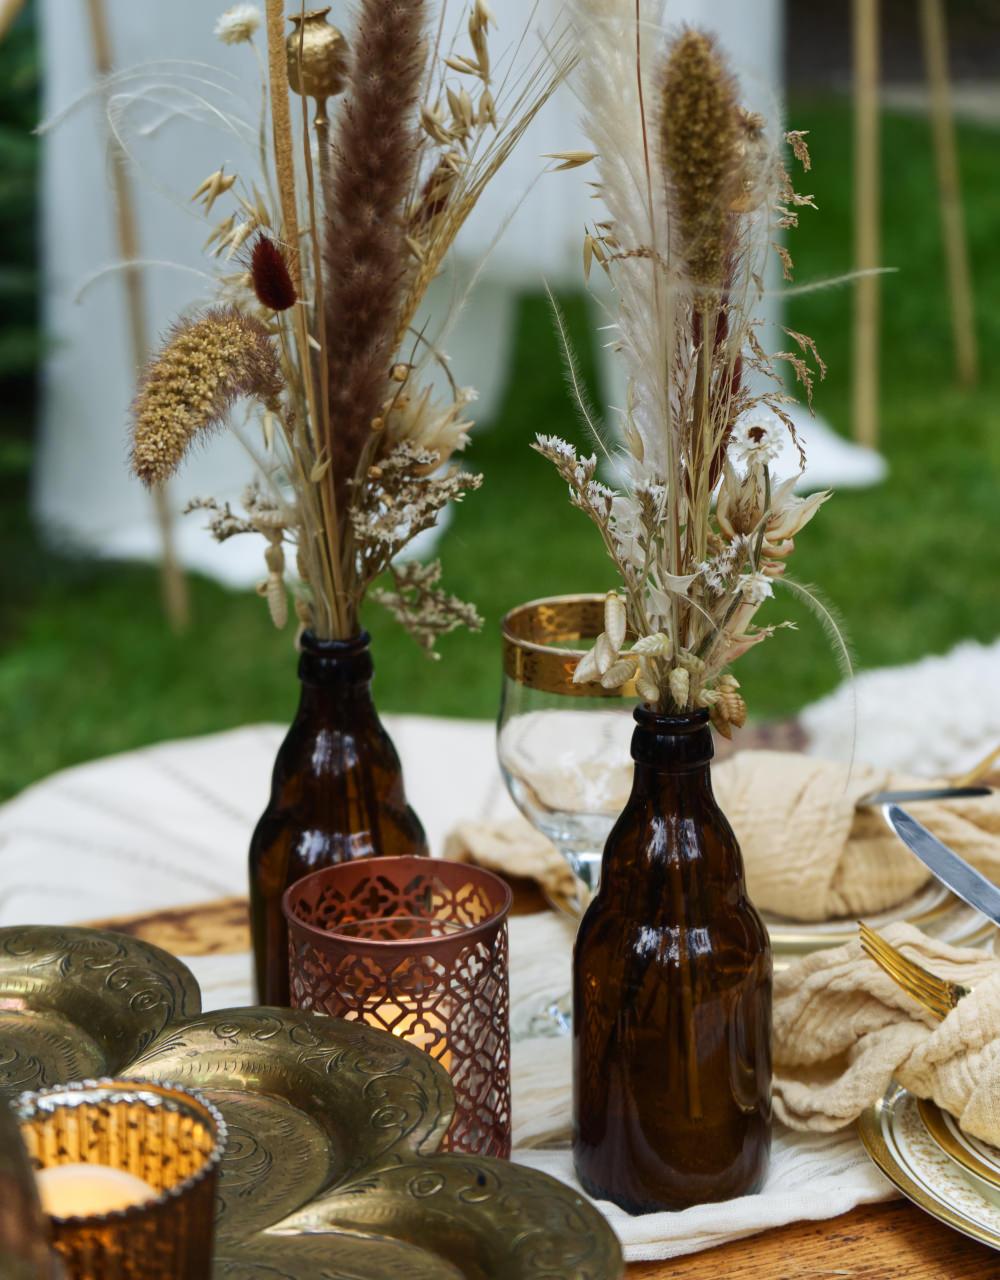 Brown Bottles Flowers Grasses Pampas Grass Seeds Moroccan Wedding Inspiration Luke Batchelor Productions